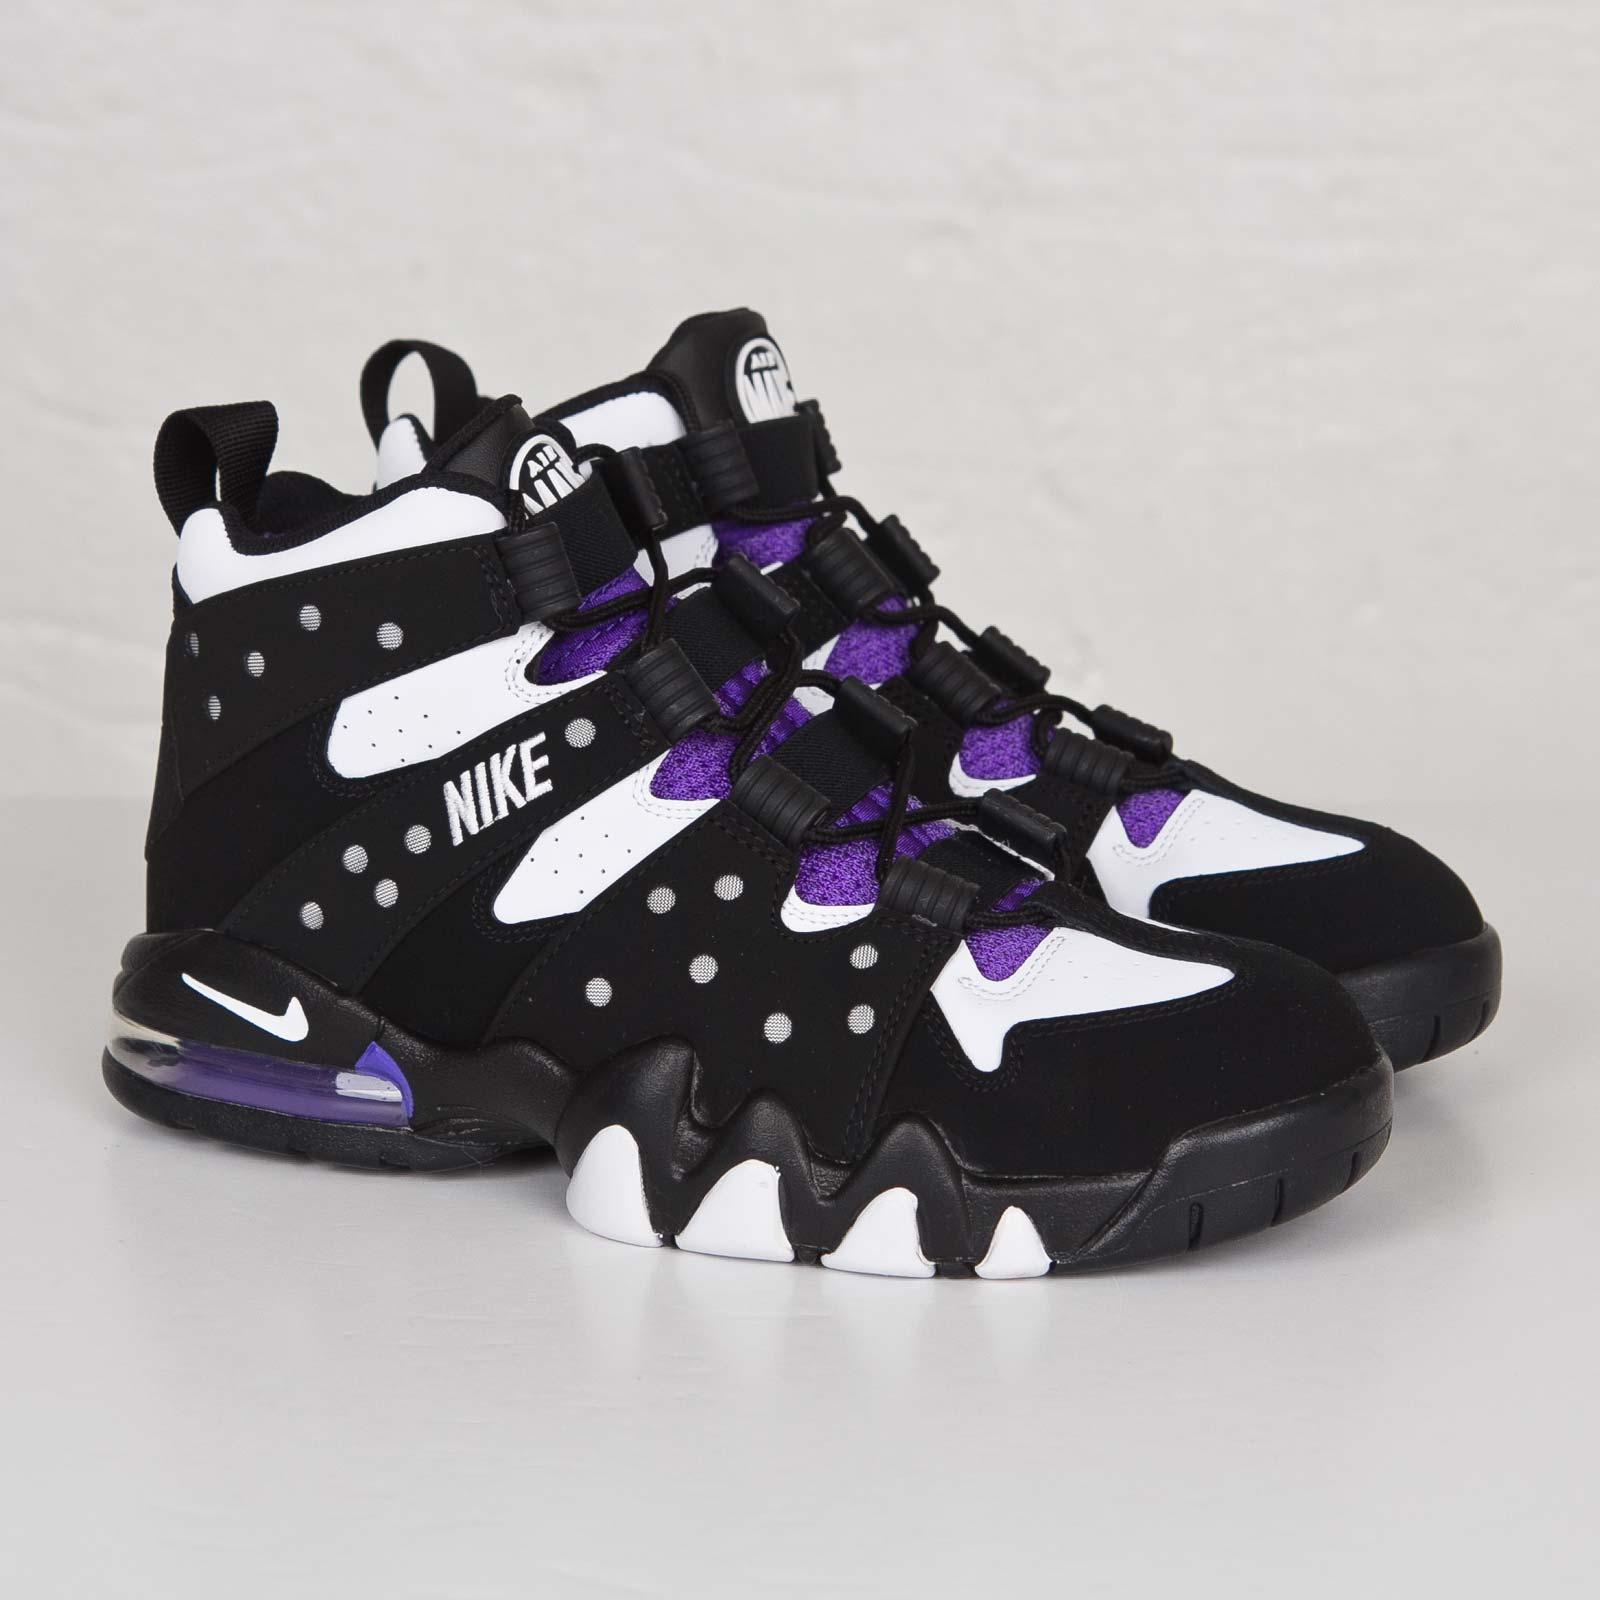 f86e0edefe Nike Air Max2 CB 94 - 305440-006 - Sneakersnstuff | sneakers ...